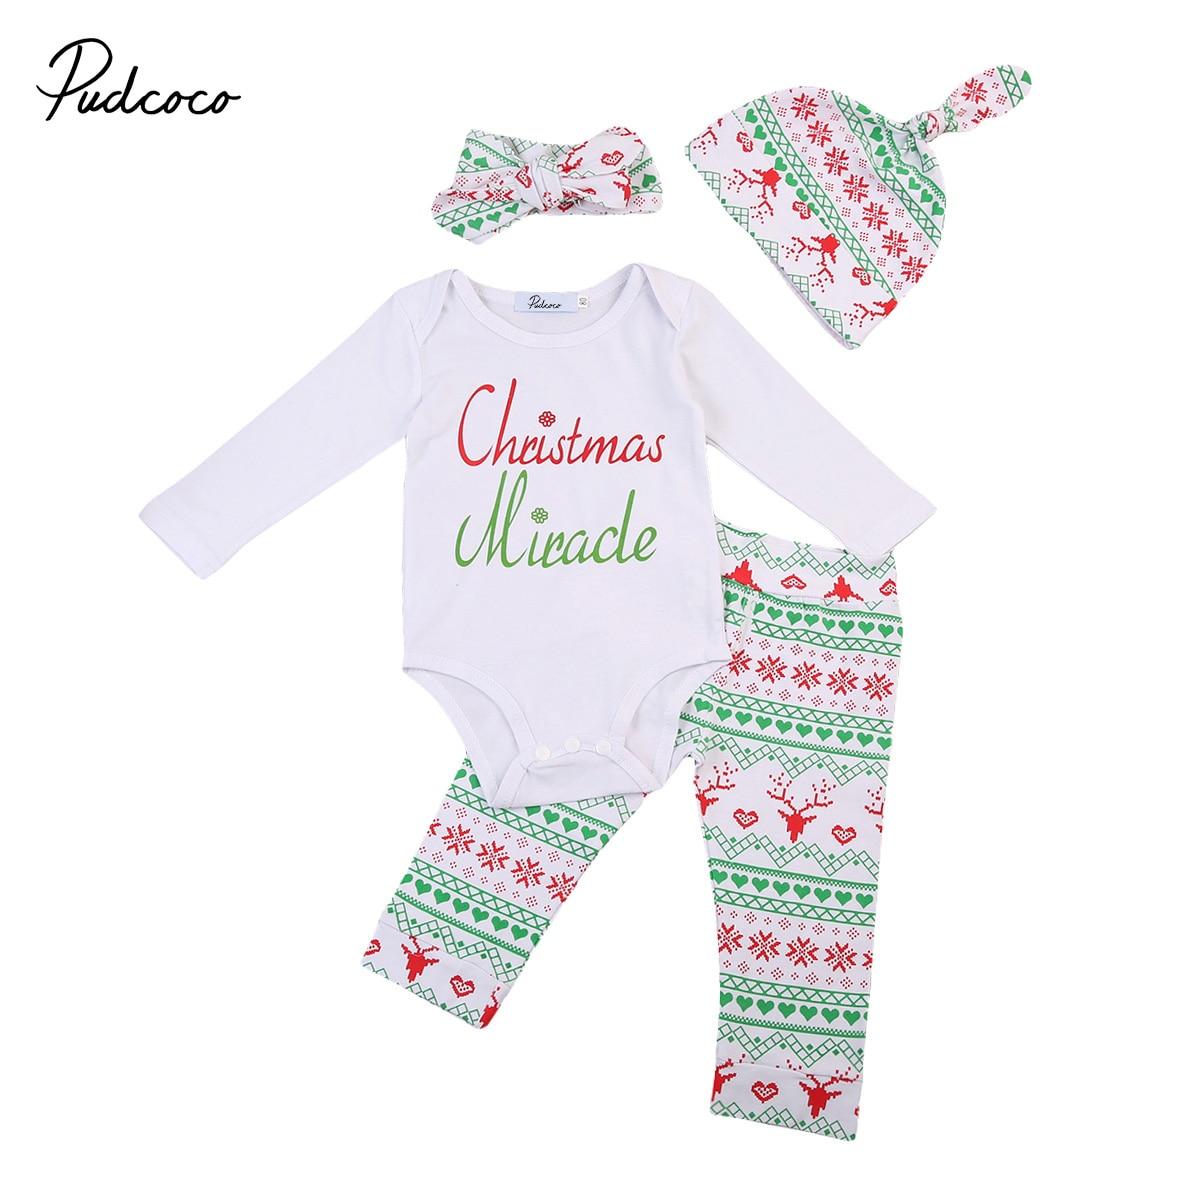 Warnen Weihnachts Neugeborenen Jungen Mädchen Langarm Herbst Strampler Boho Hosen Outfits Kleidung